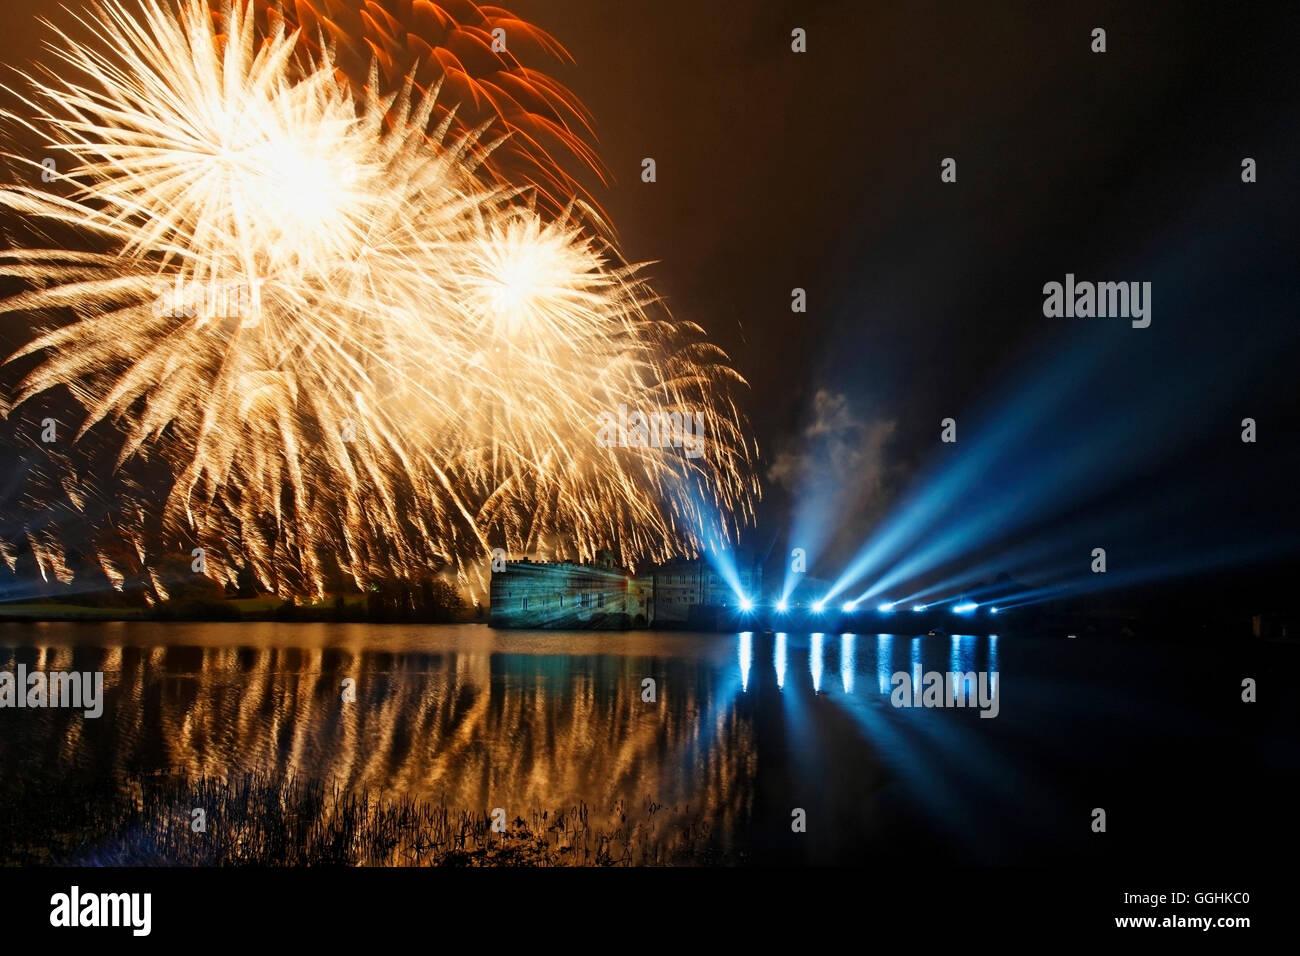 Feuerwerk am Leeds Castle, Maidstone, Kent, England, Großbritannien Stockbild